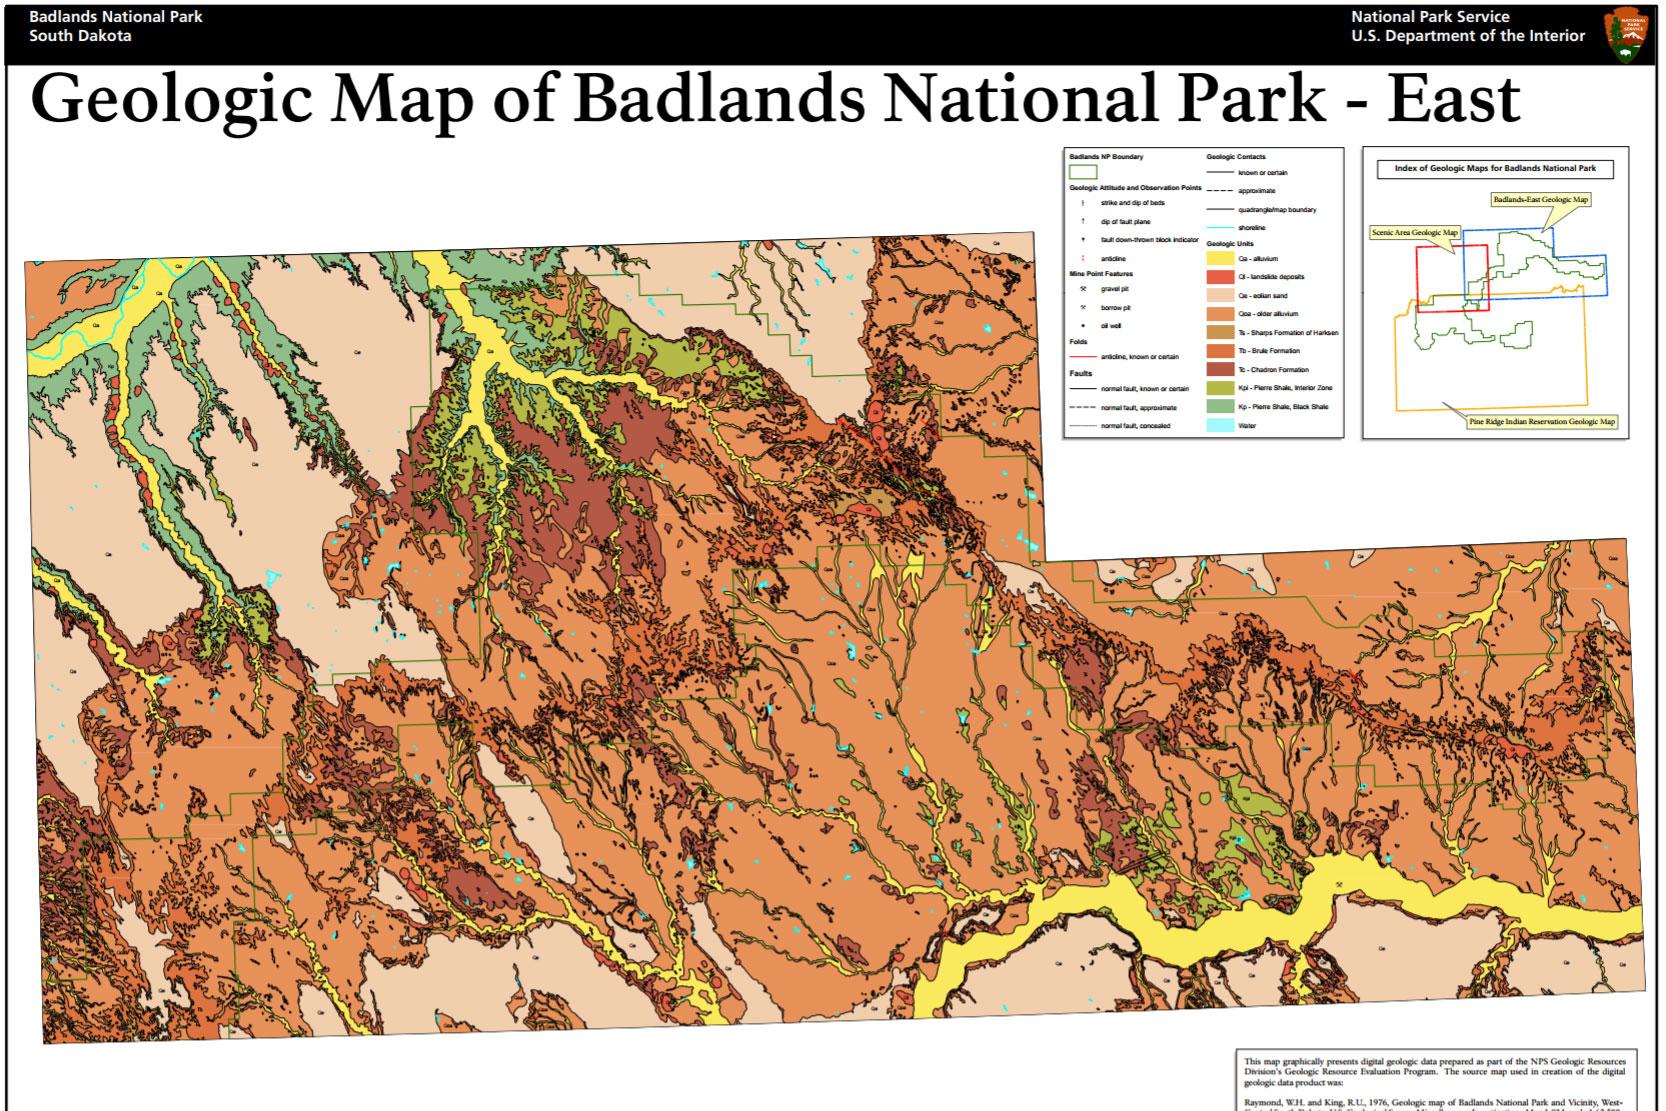 Badlands Nebraska Map.Nps Geodiversity Atlas Badlands National Park South Dakota U S